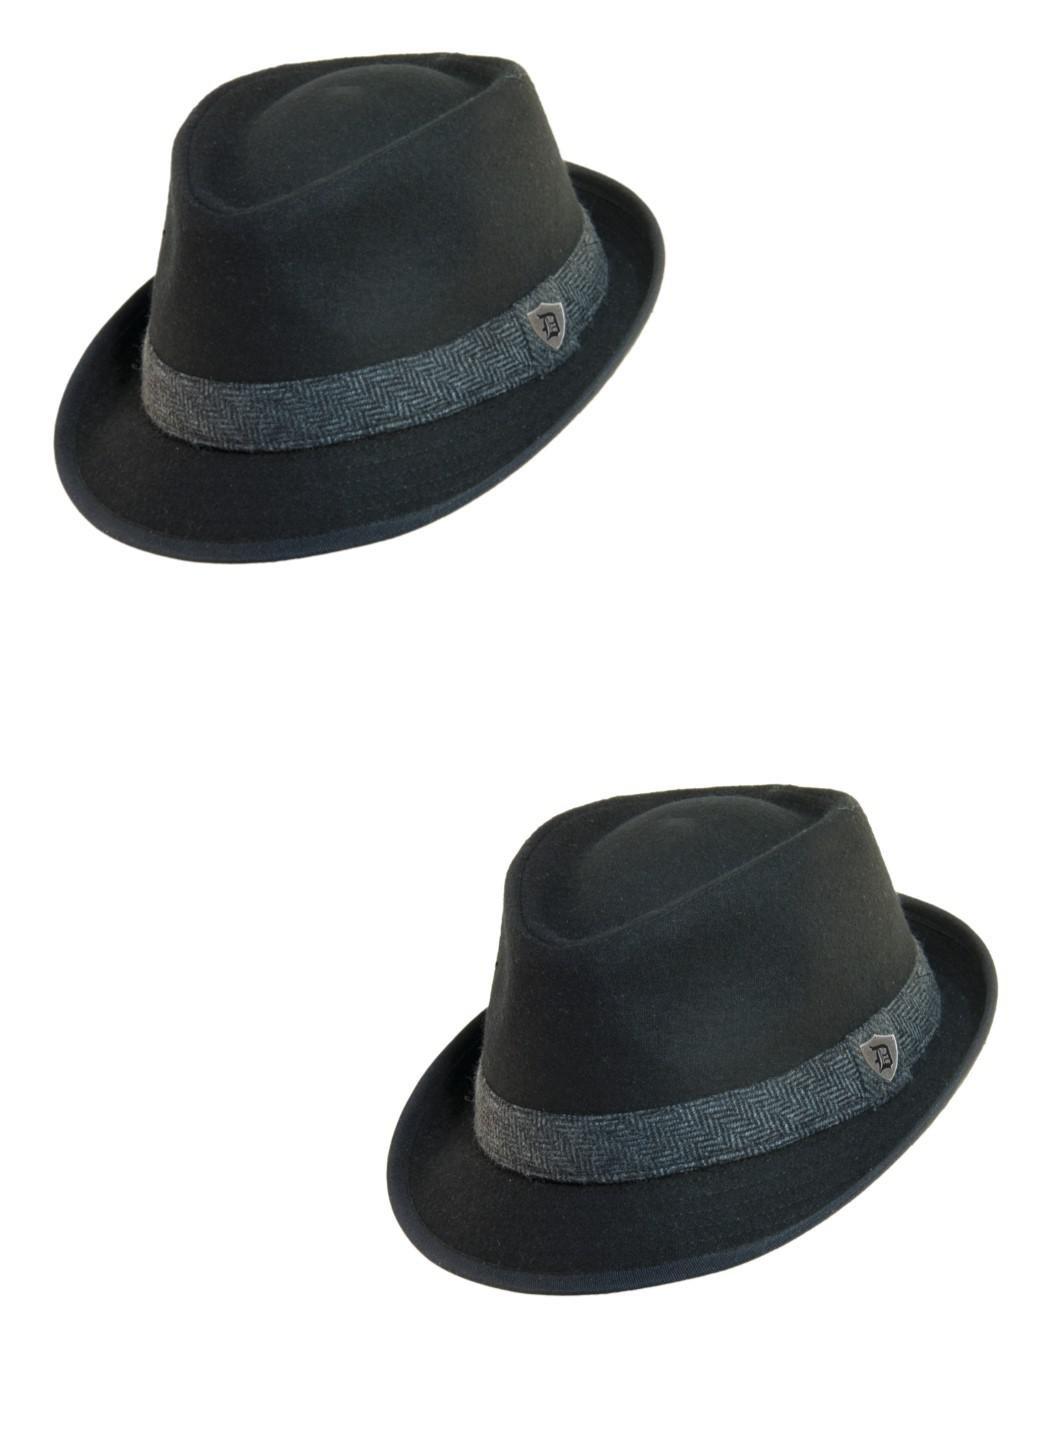 Dorfman Pacific Men's Wool Blend Fedora Hat with Herringbone Band (Pack of 2)